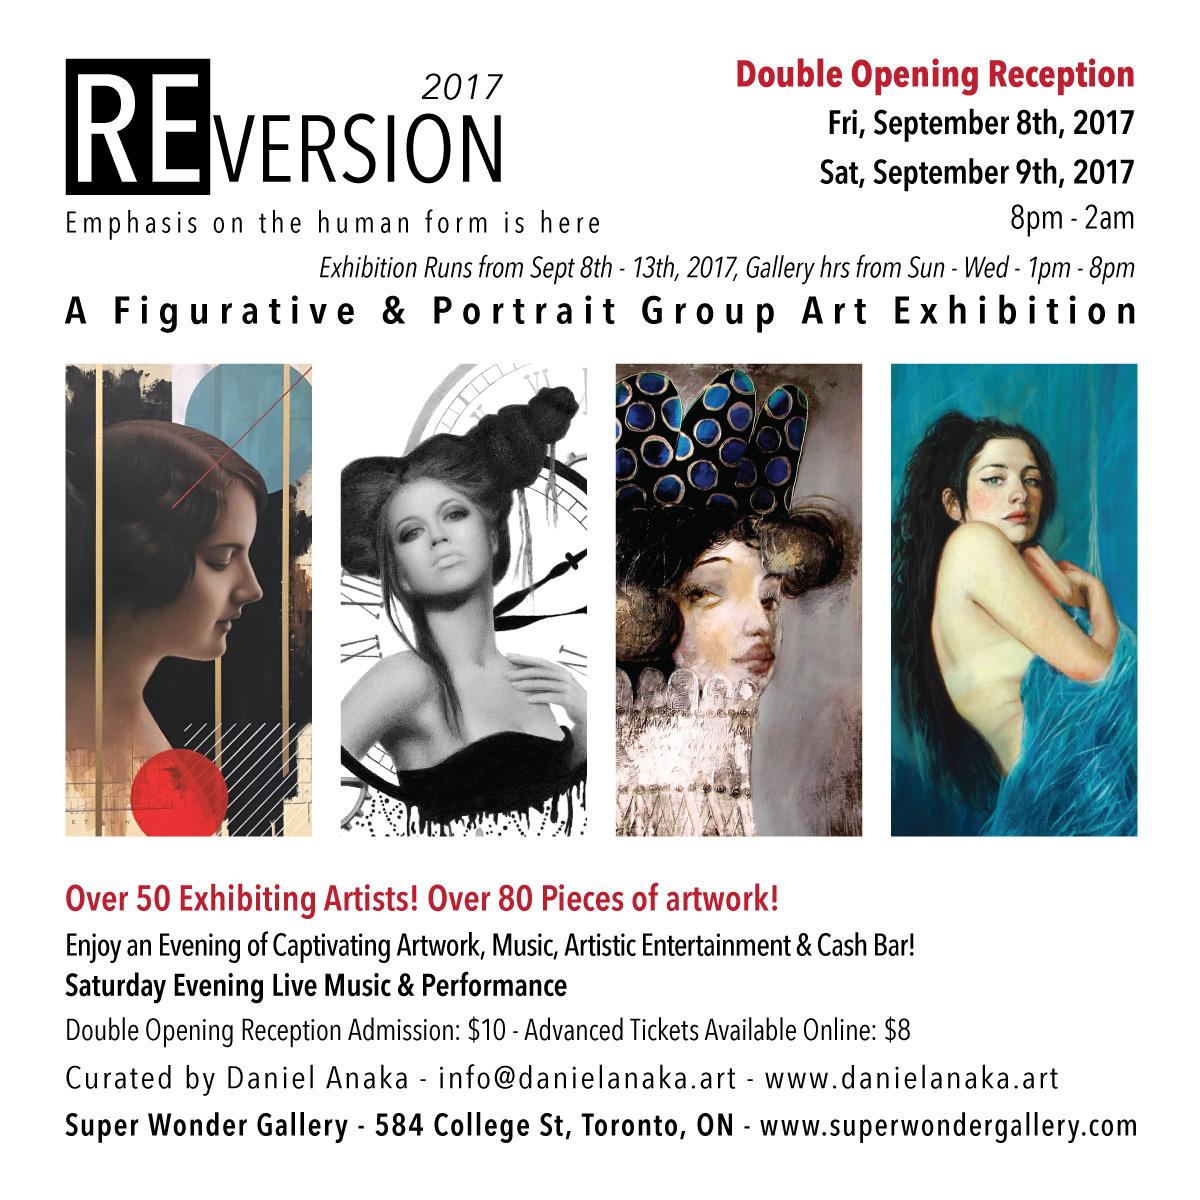 Reversion 2017 - A Figurative & Portrait Art Exhibition - Toronto - Double Opening Reception Fri, Sept, 8th & Sat, Sept, 9th, 8pm - 2am. SUPER WONDER GALLERY, 584 COLLEGE STREET, TORONTO, ON